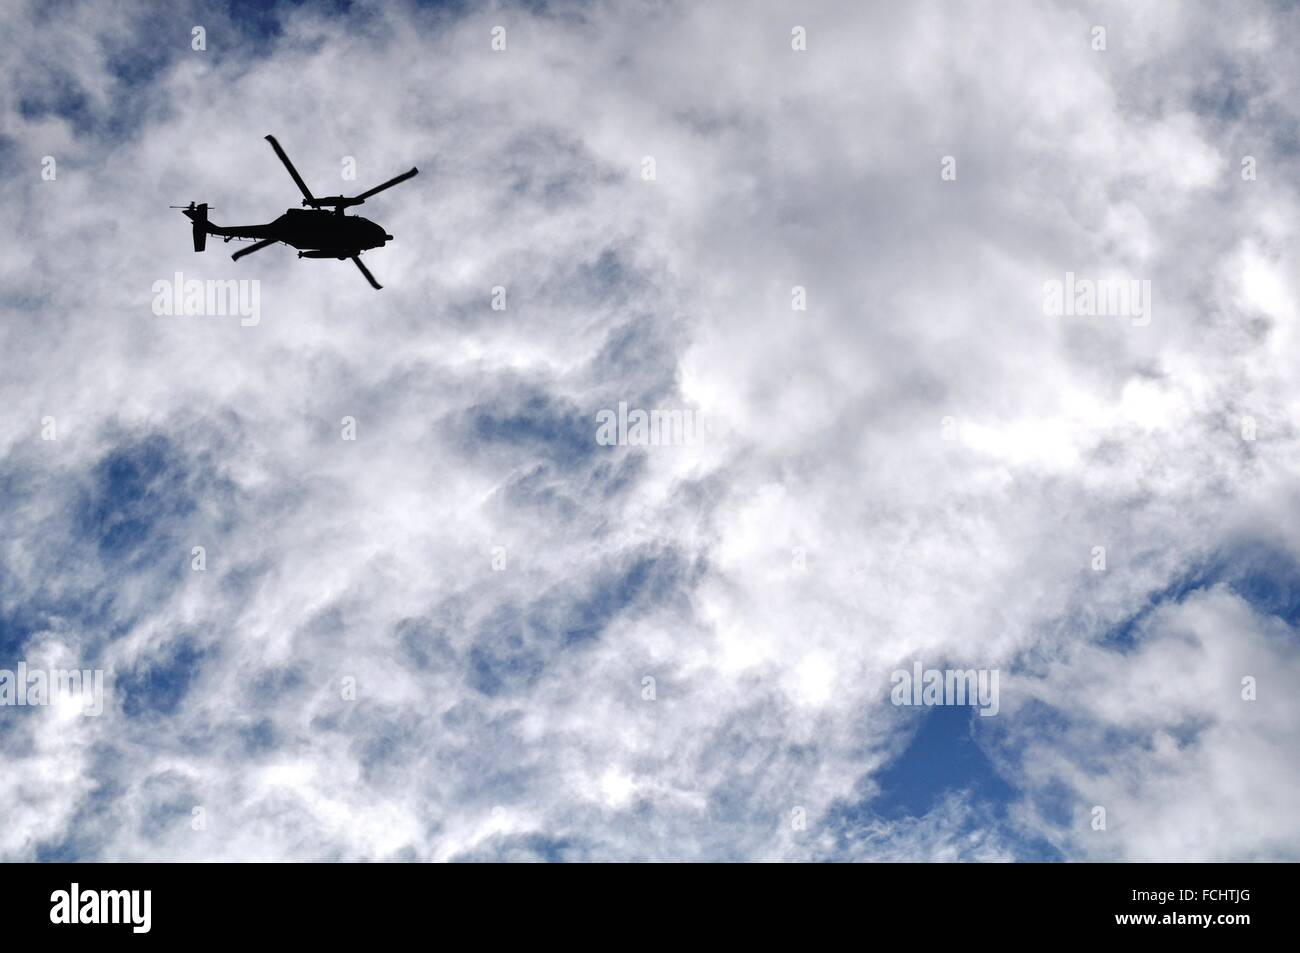 Okinawa, Japan: military helicopter flying on the Kerama Islands - Stock Image